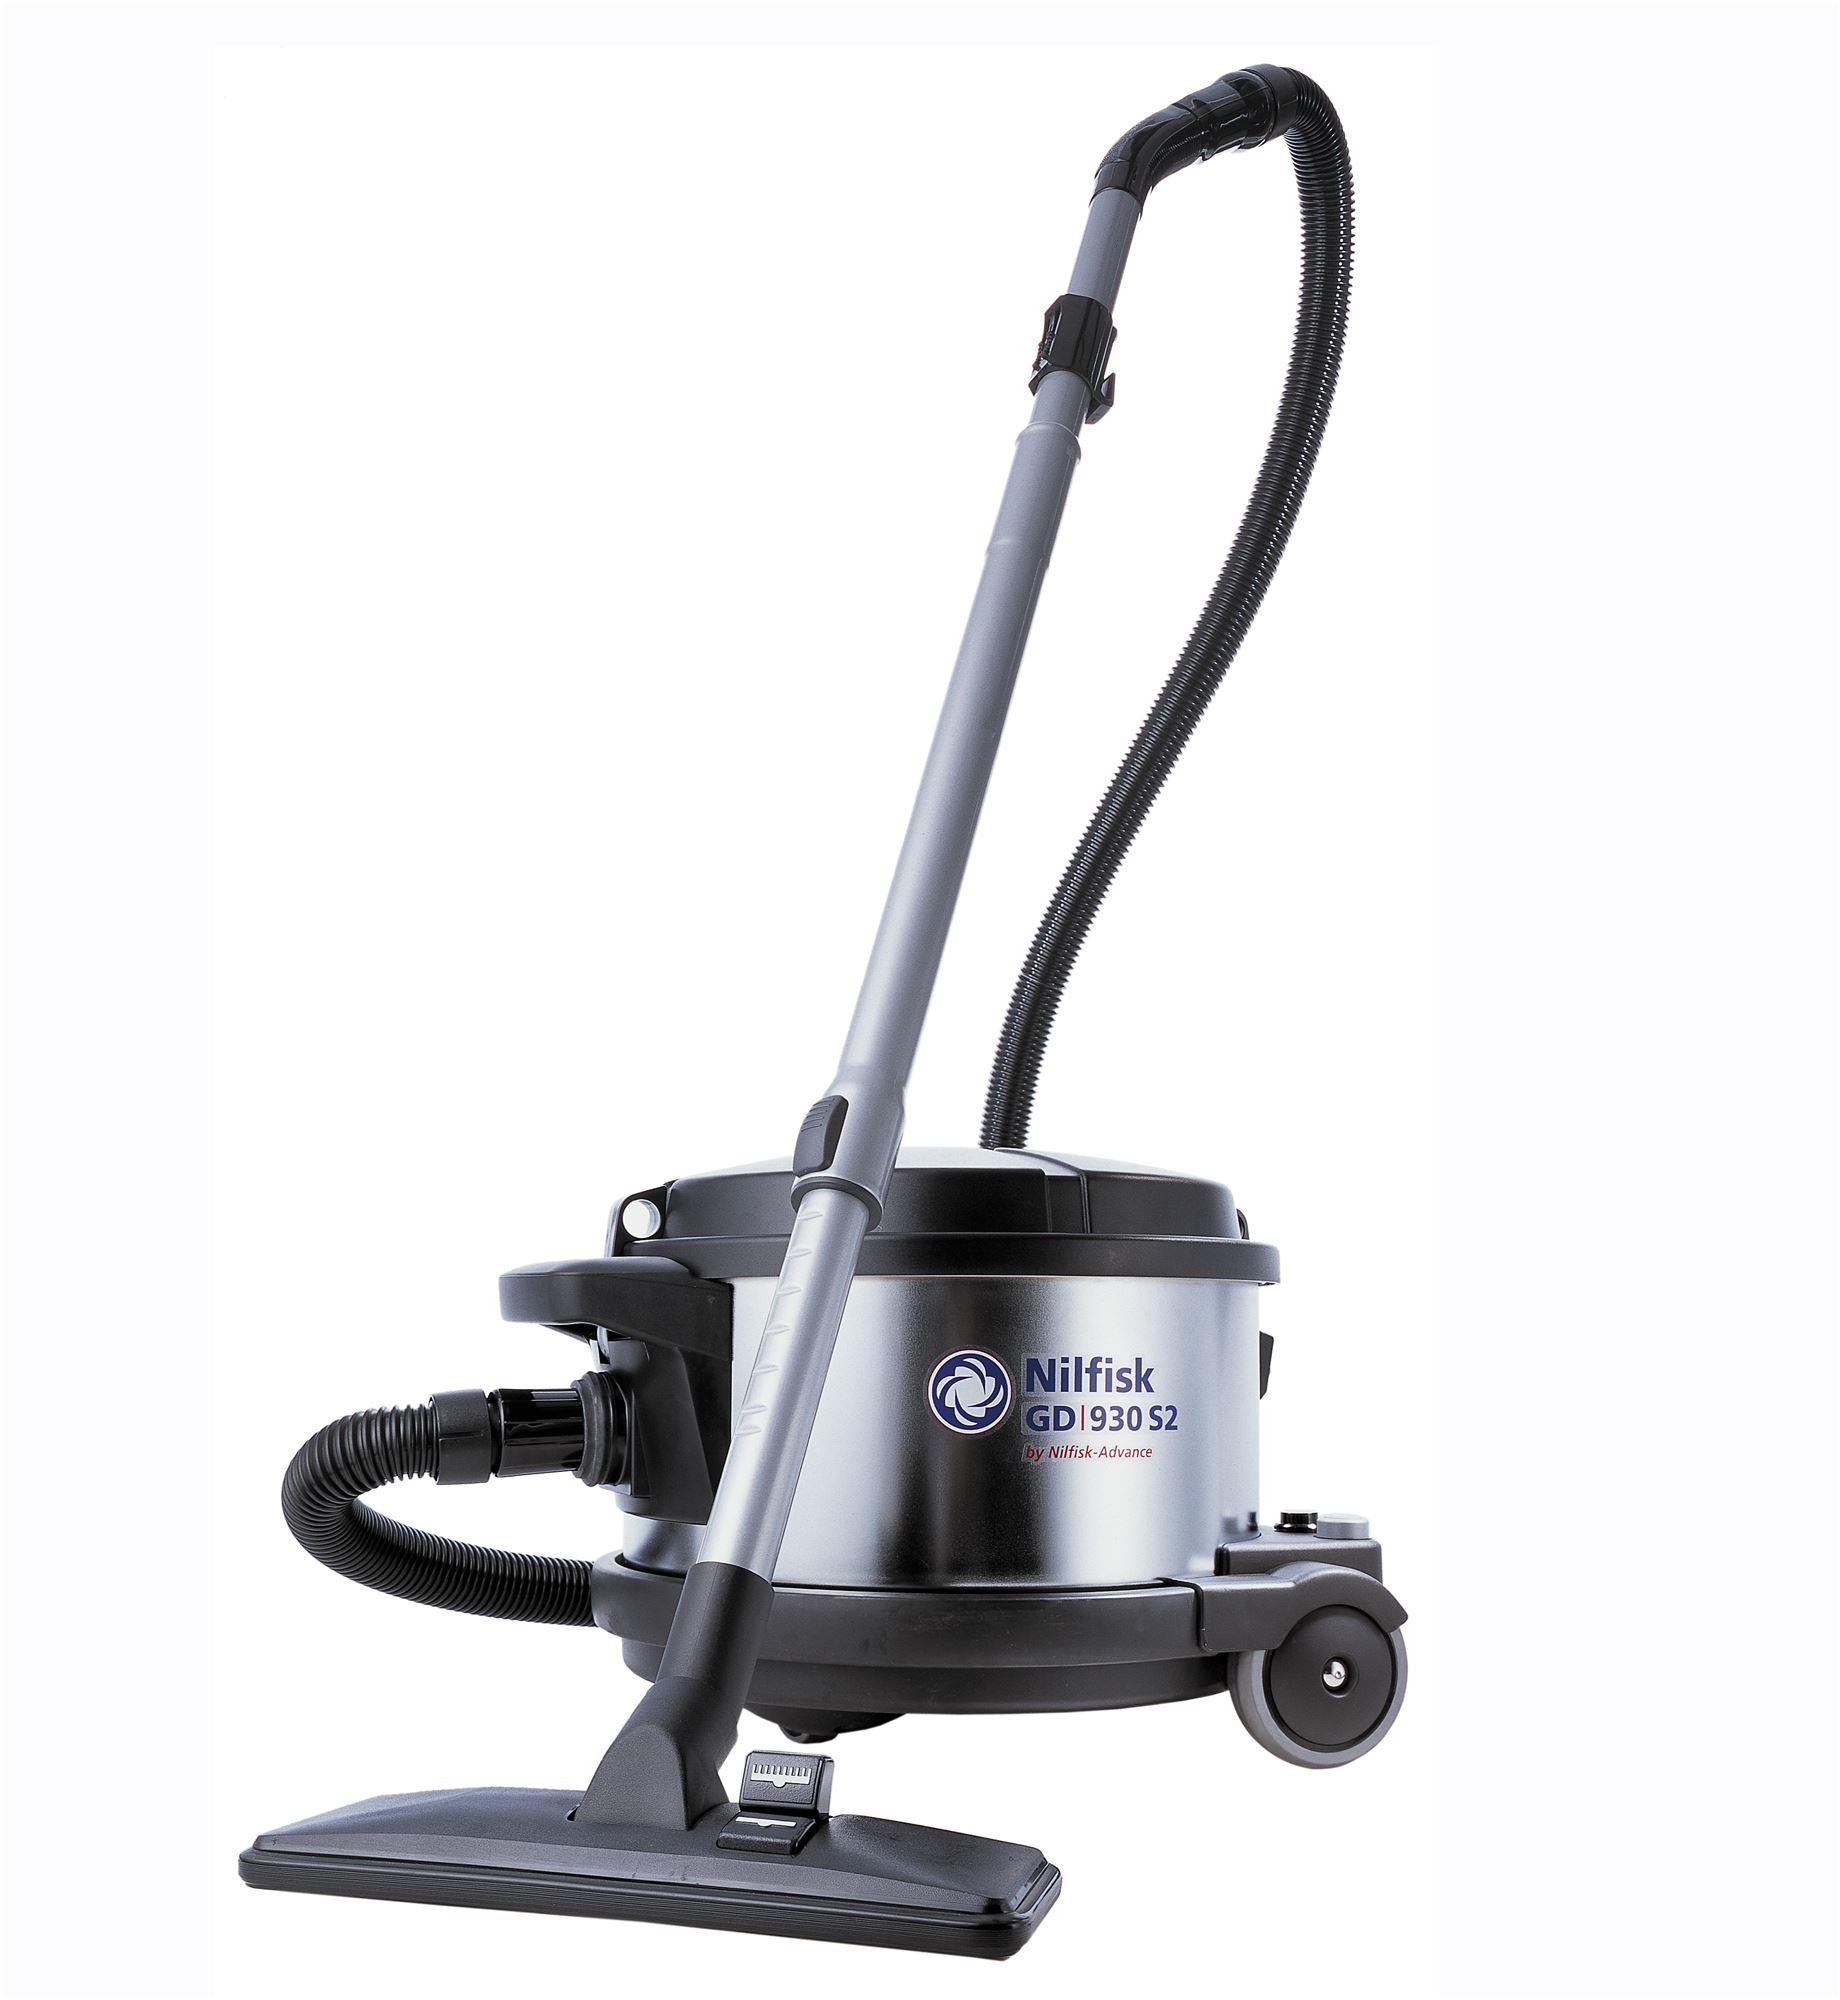 Nilfisk Gd 930 Vacuum Cleaner Promo